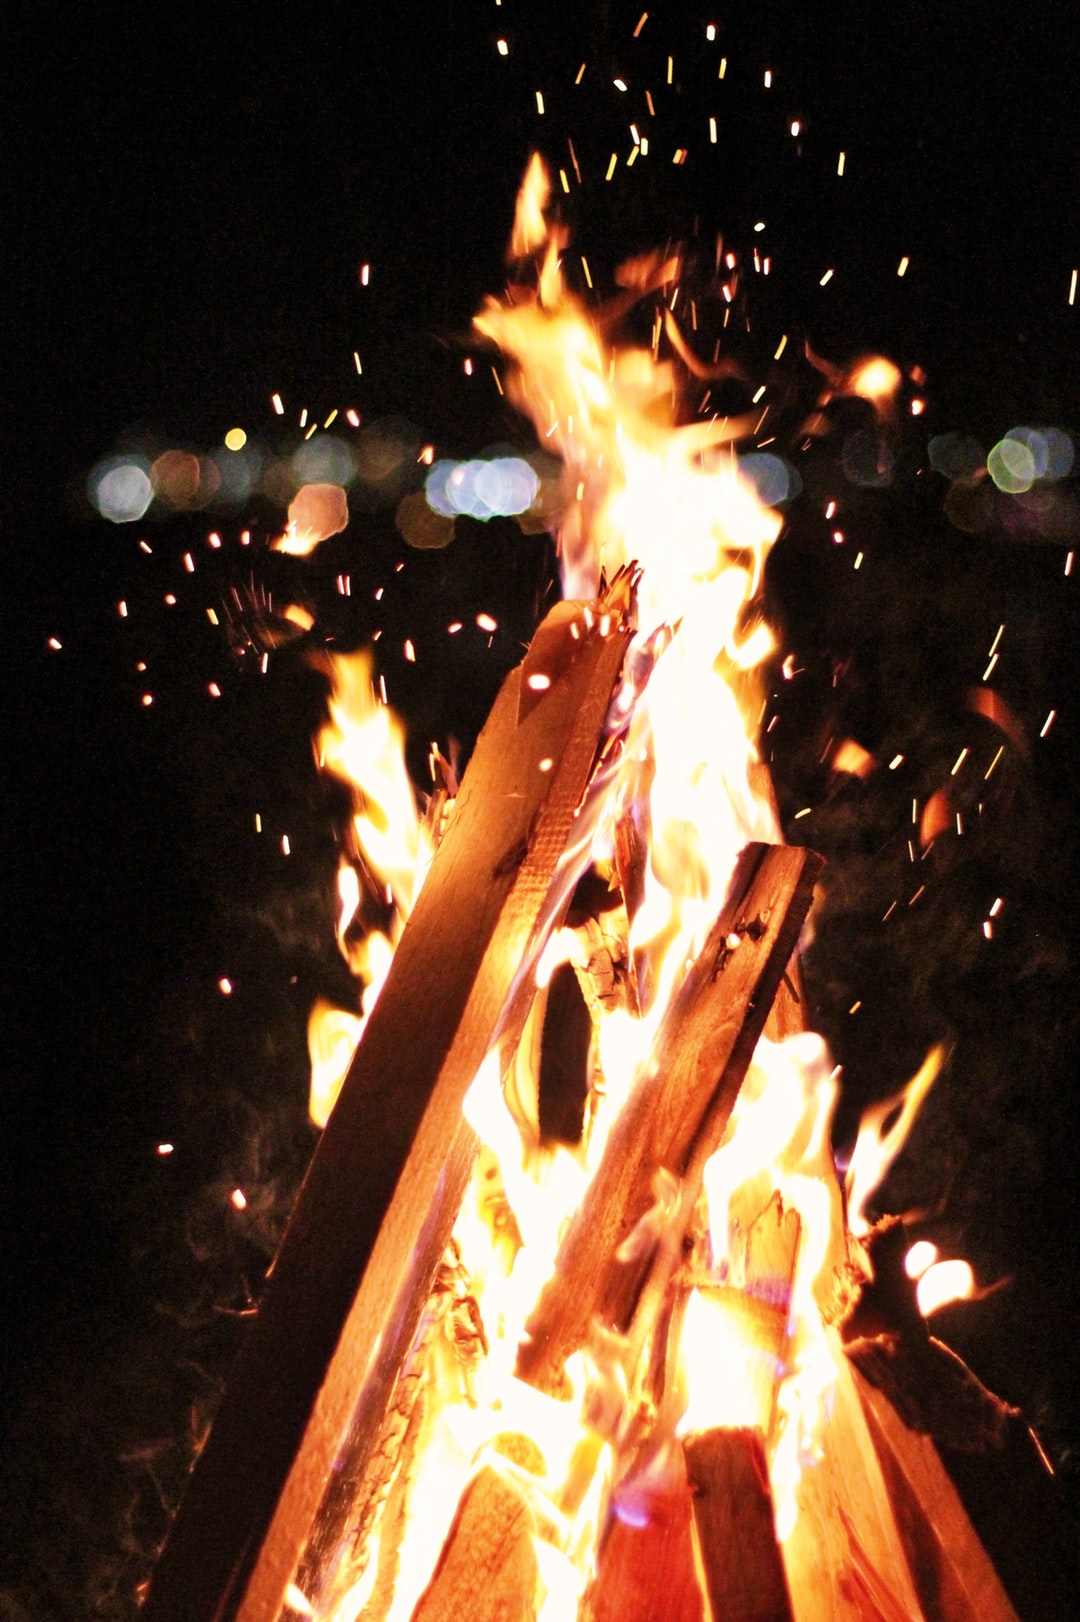 it's the start of bonfire season